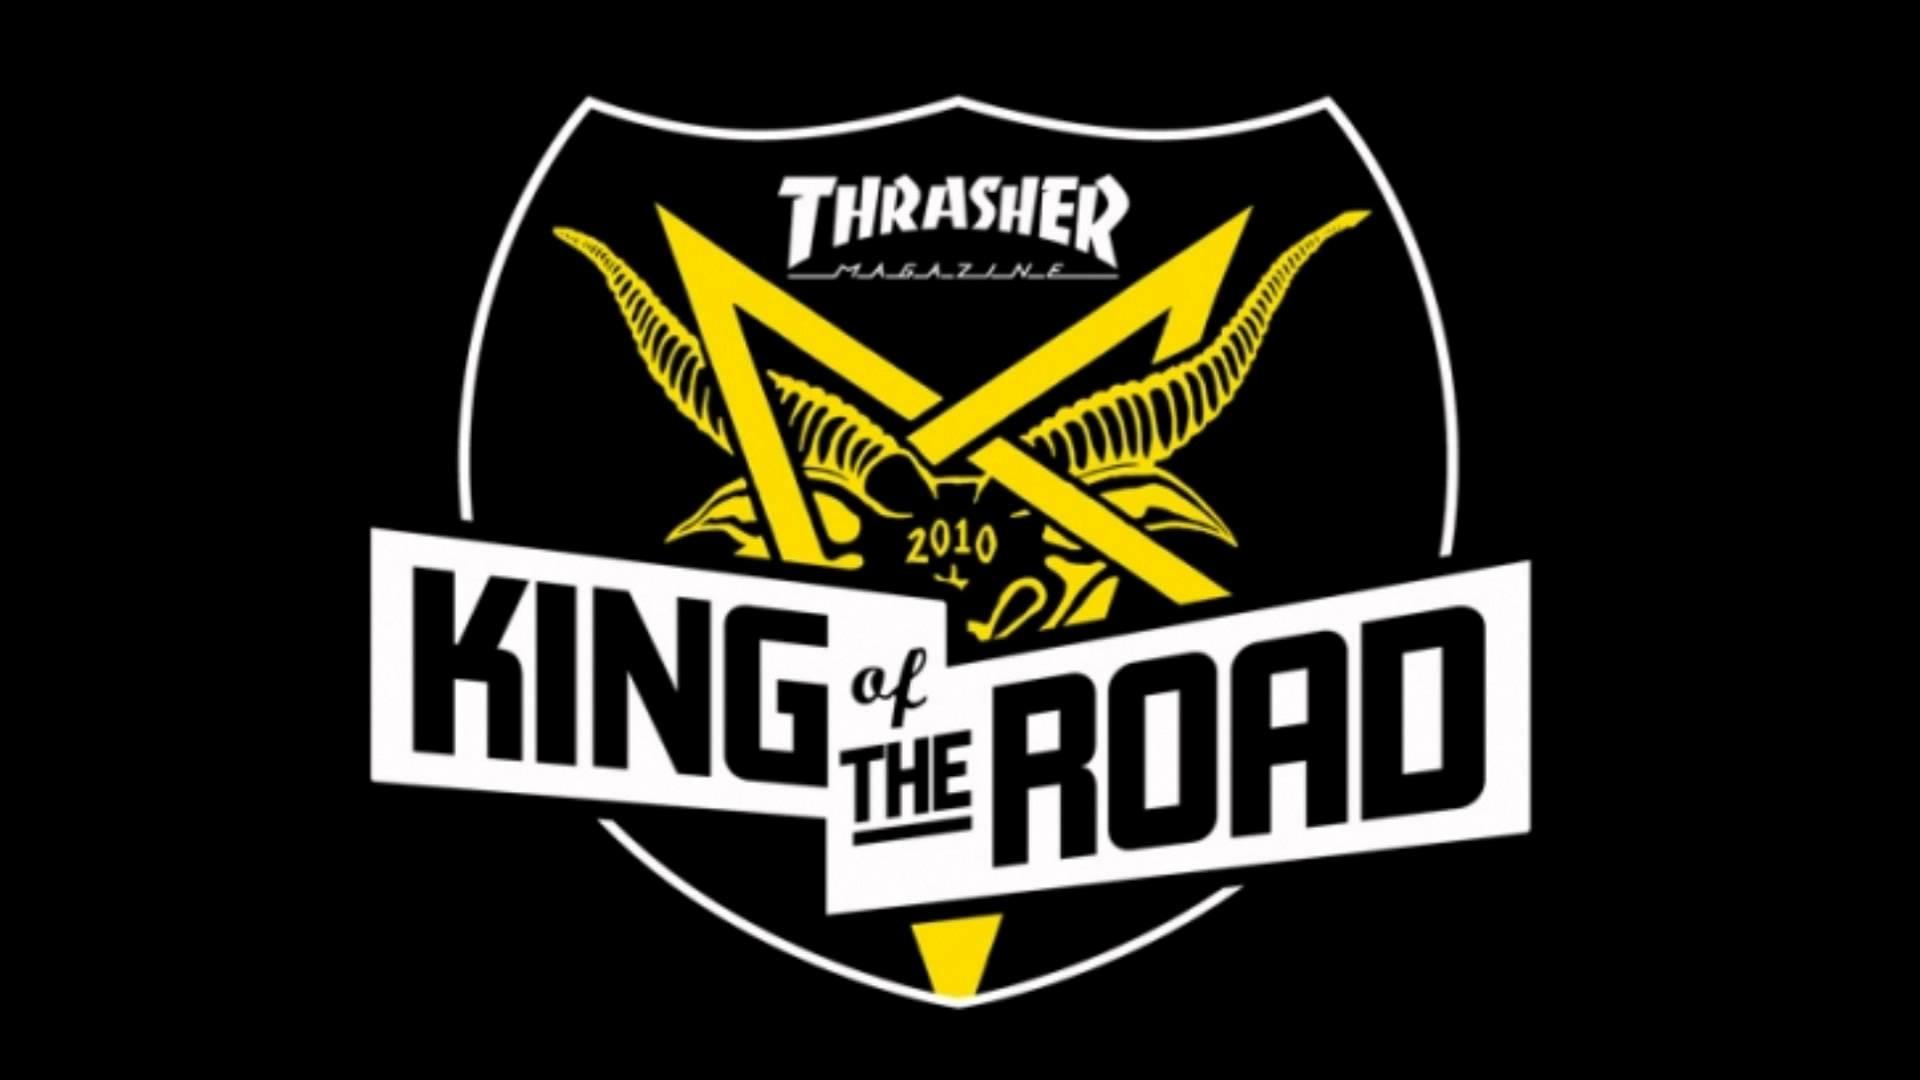 Free Download Thrasher Magazine Backgrounds – wallpaper.wiki